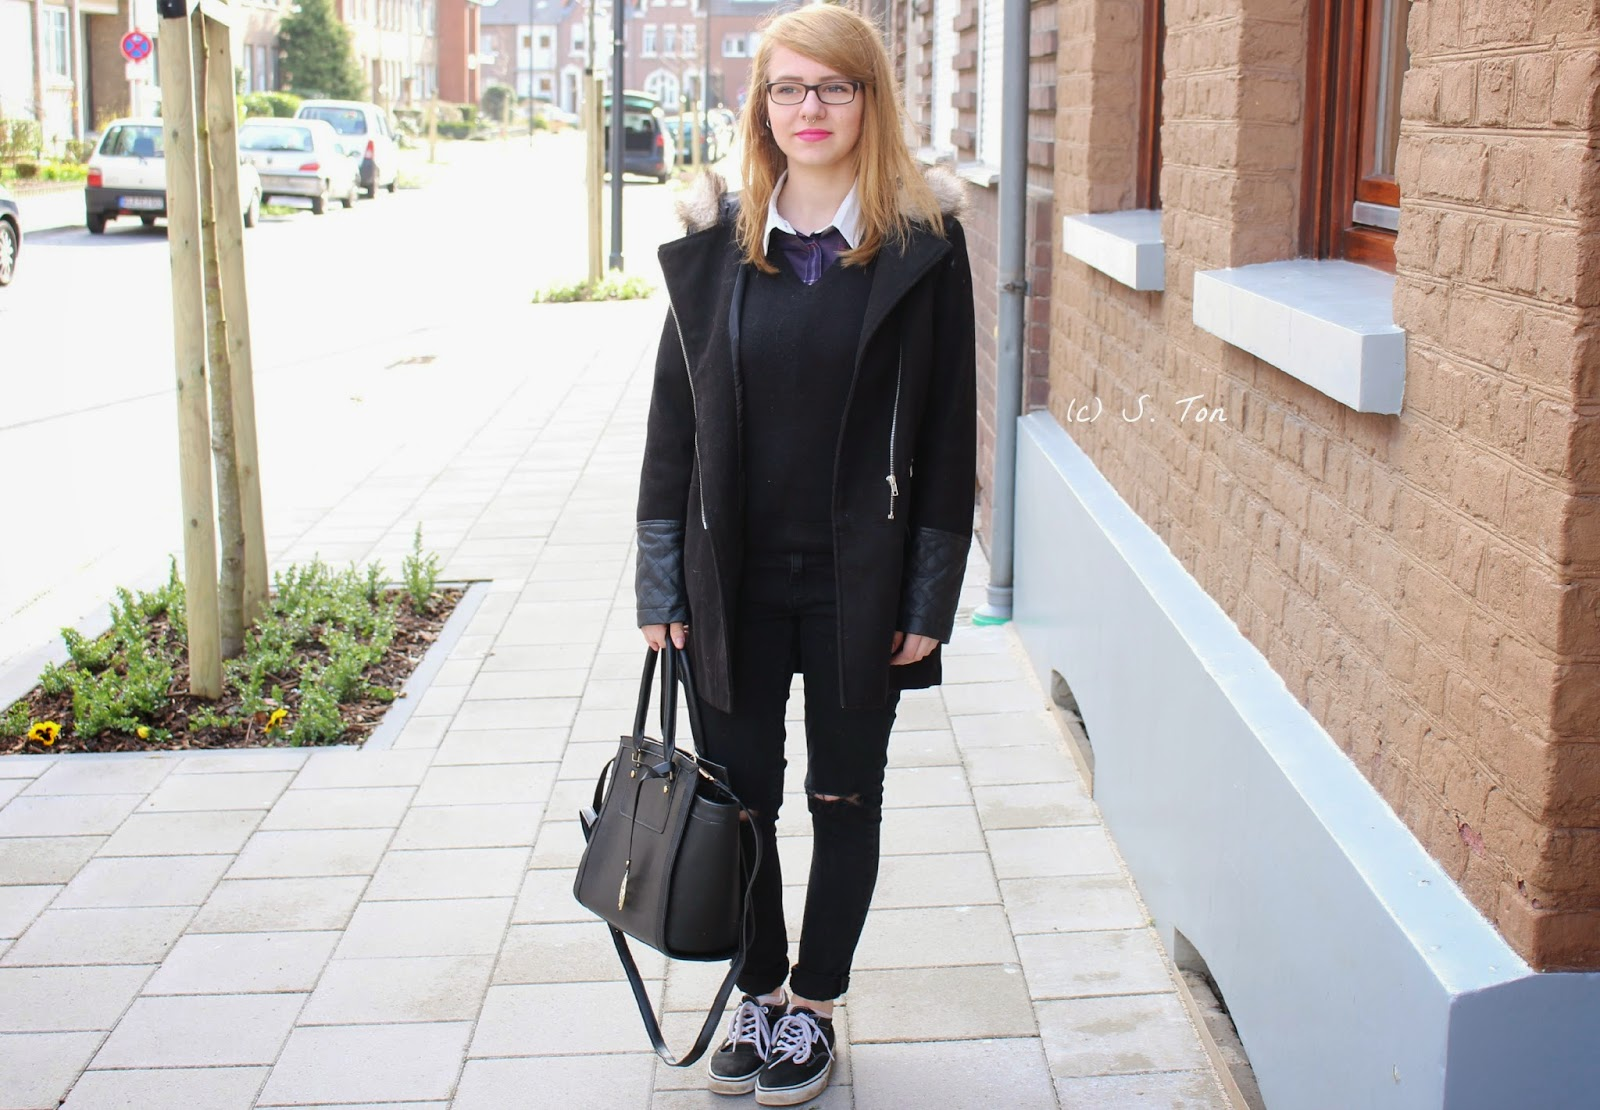 Black handbag | Outfit